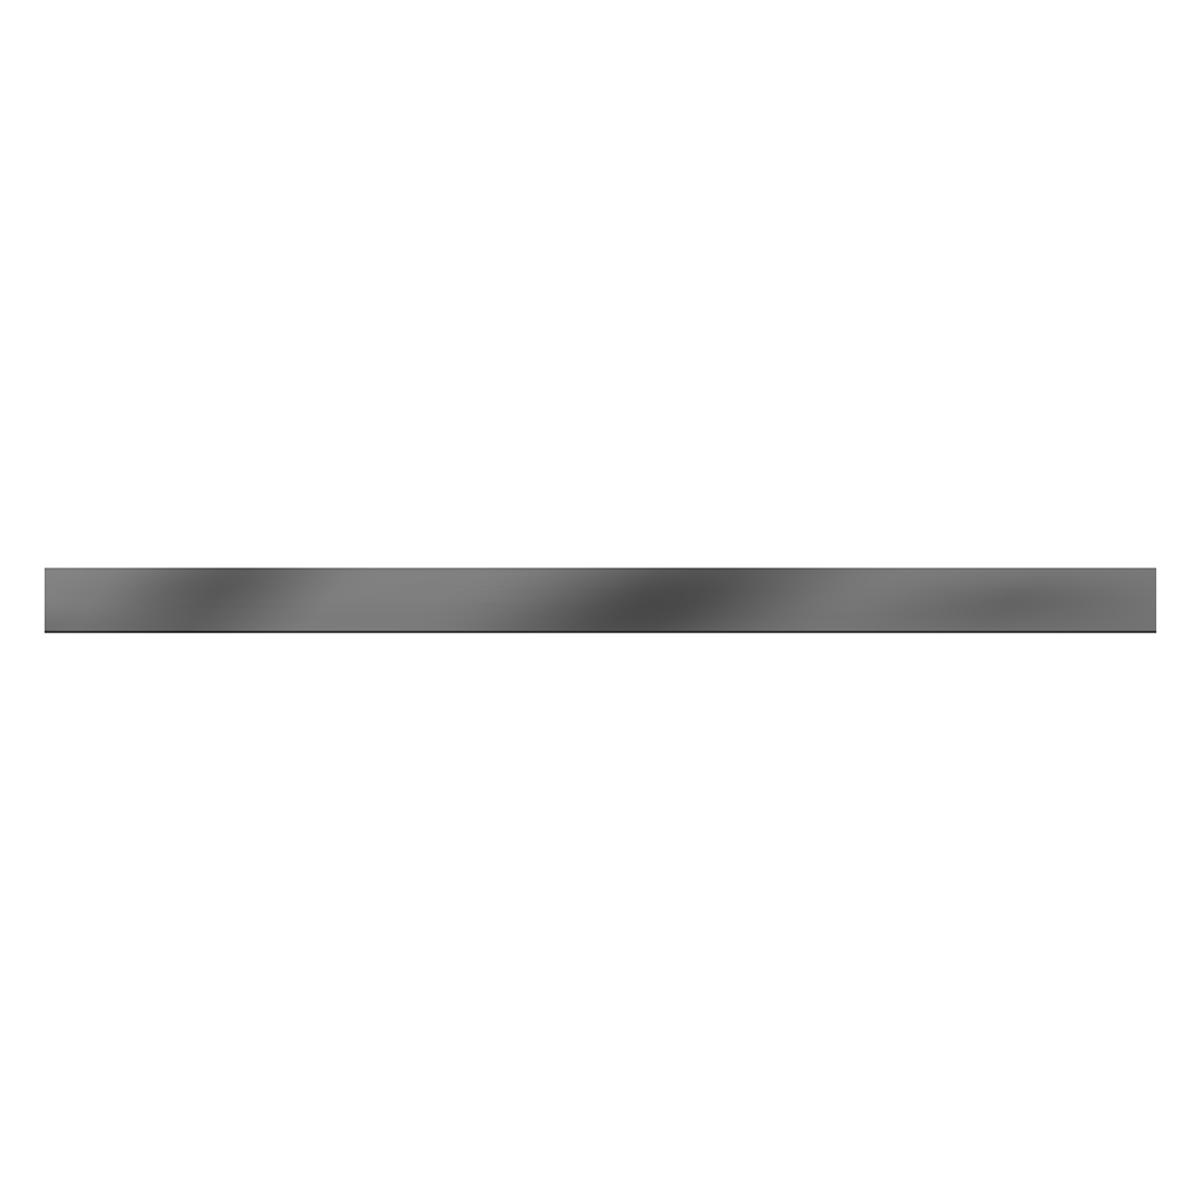 Lapiz Espejo Gris Brillante - 40X2 cm - 1 pza